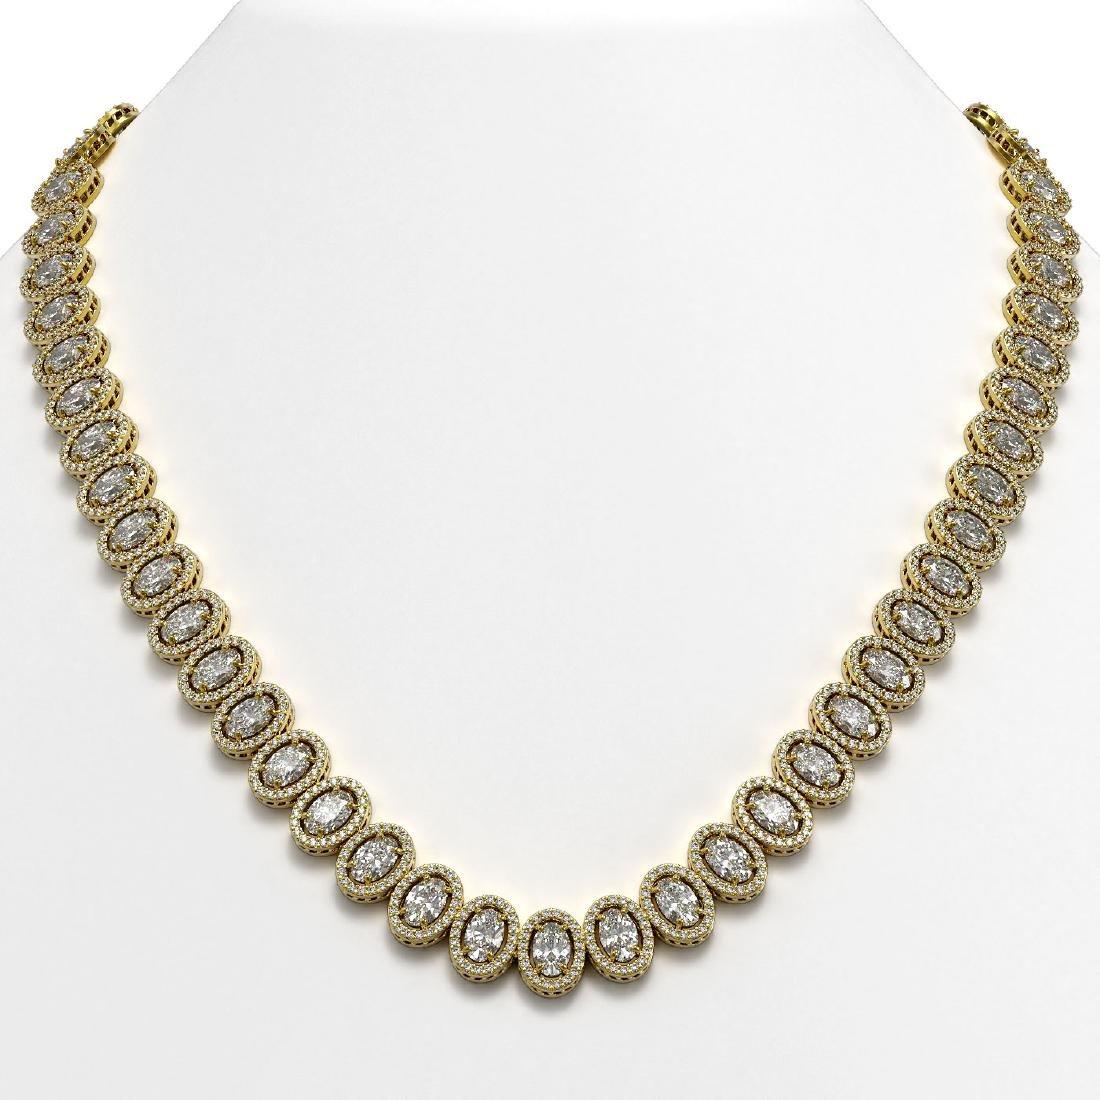 42.56 CTW Oval Diamond Designer Necklace 18K Yellow